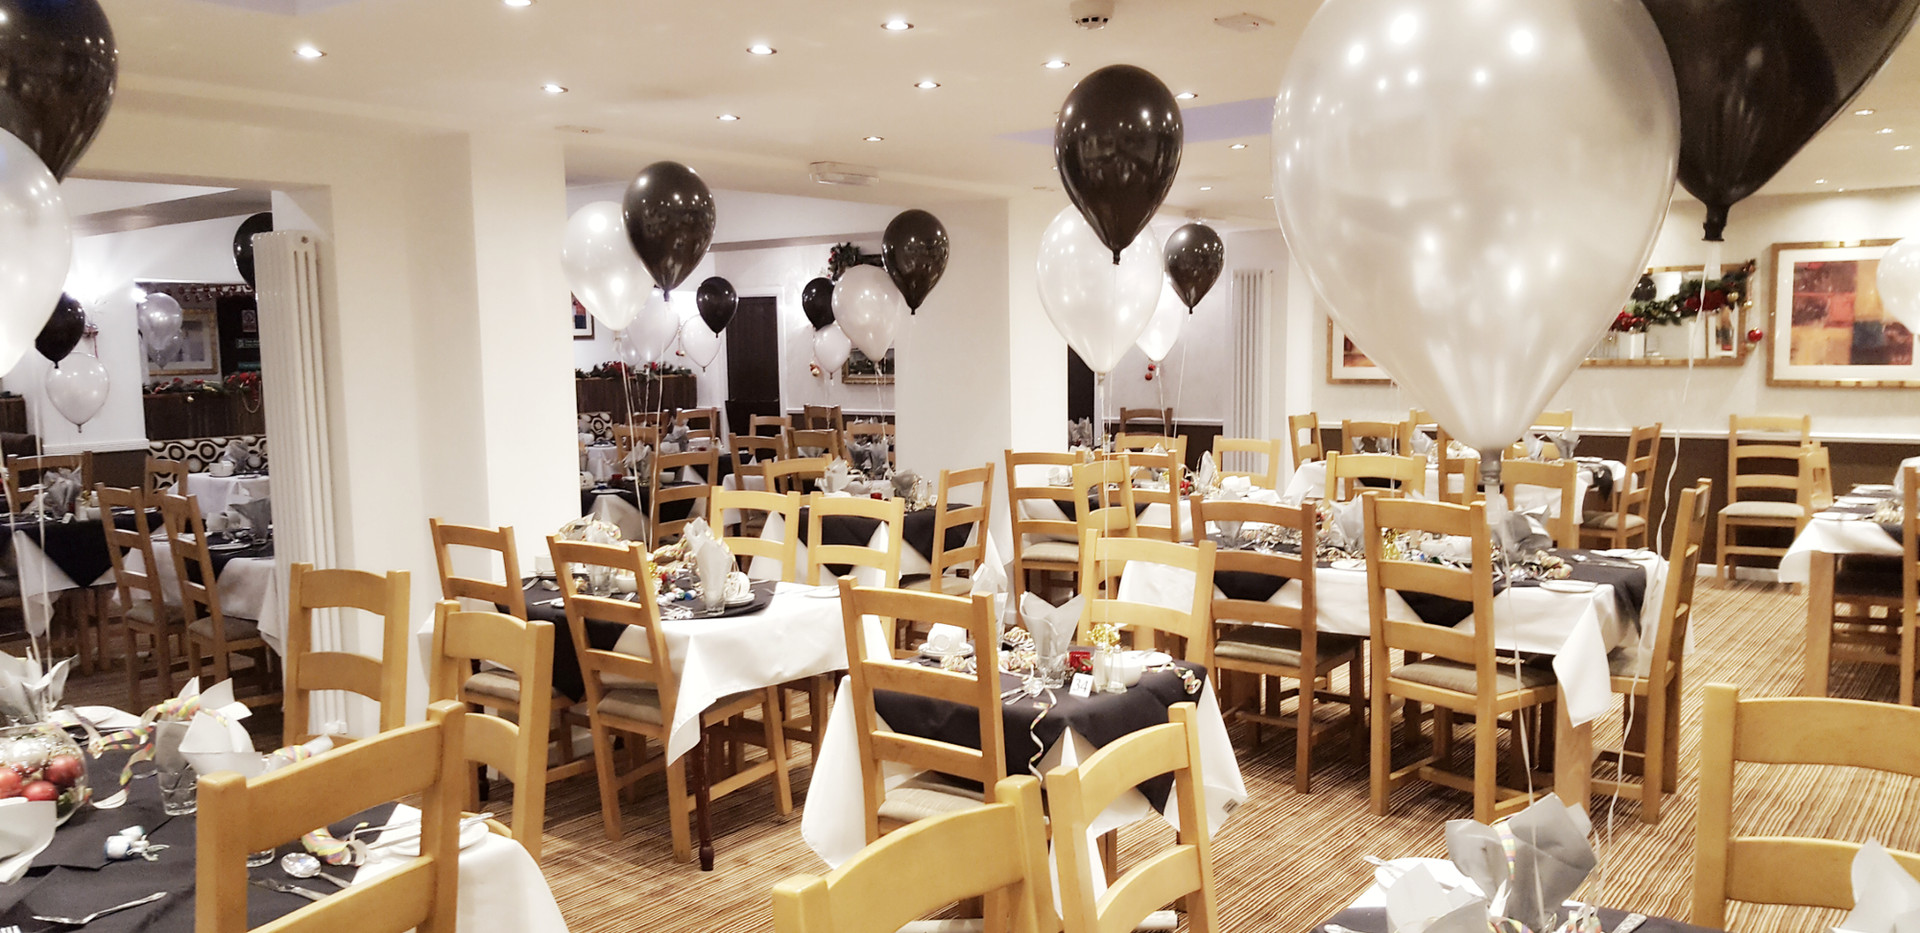 seabank dining ballons.jpg